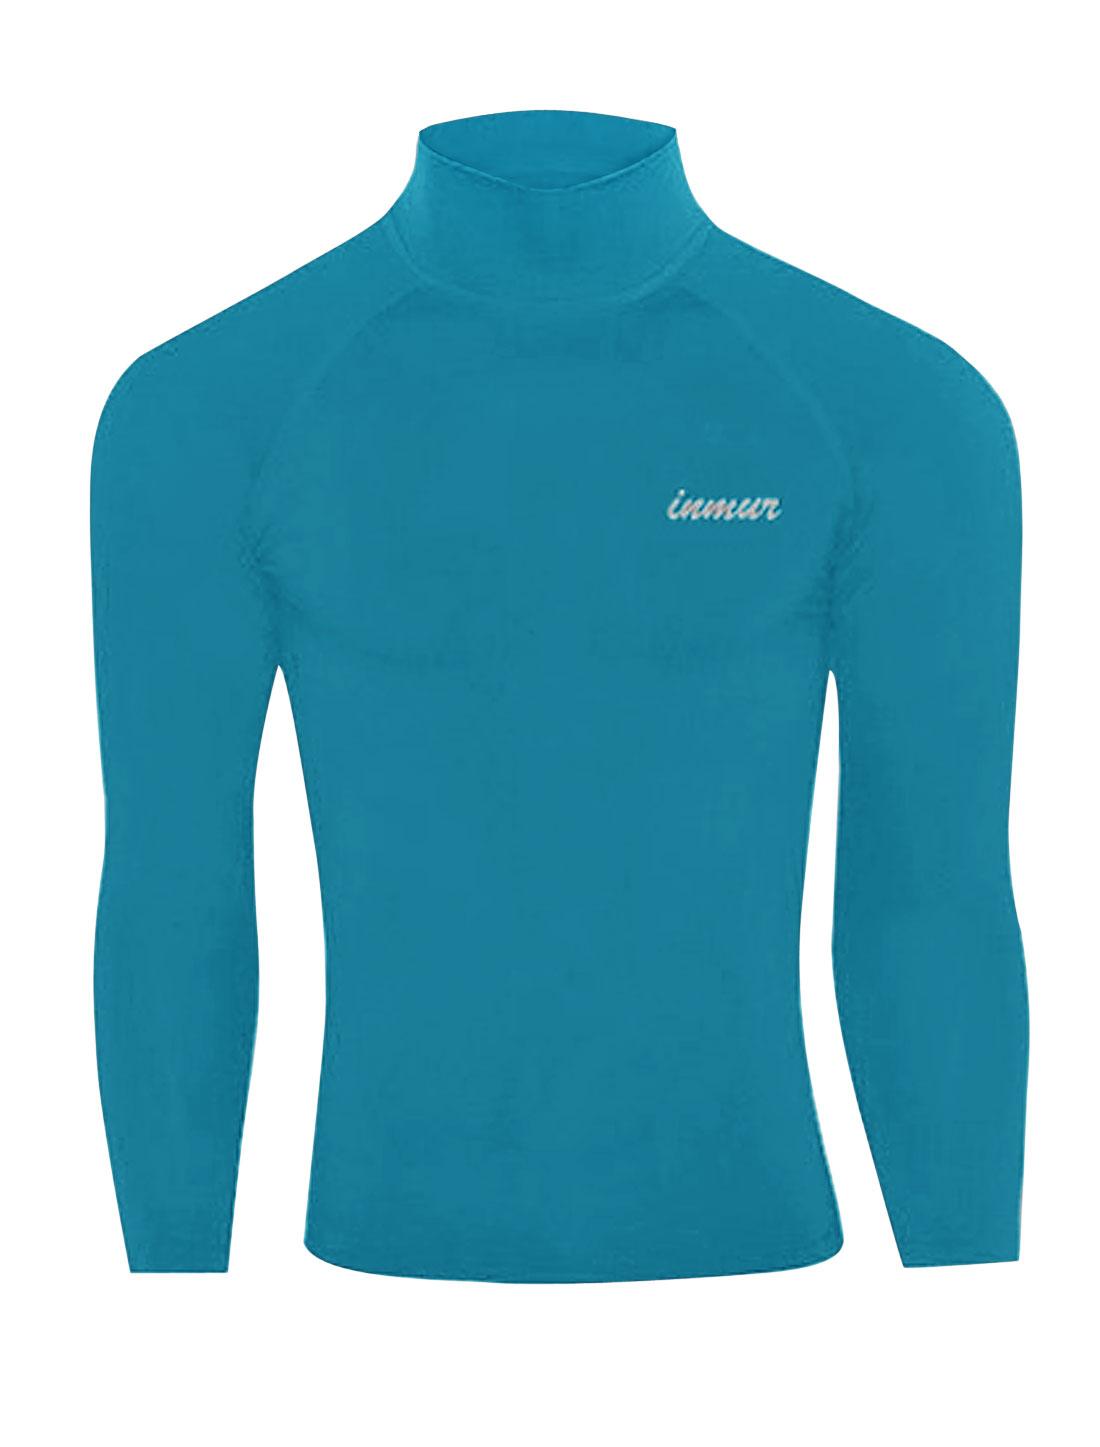 Men Mock Neck Raglan Sleeve Letters Detail Fitness Sports T-shirt Sea Blue M